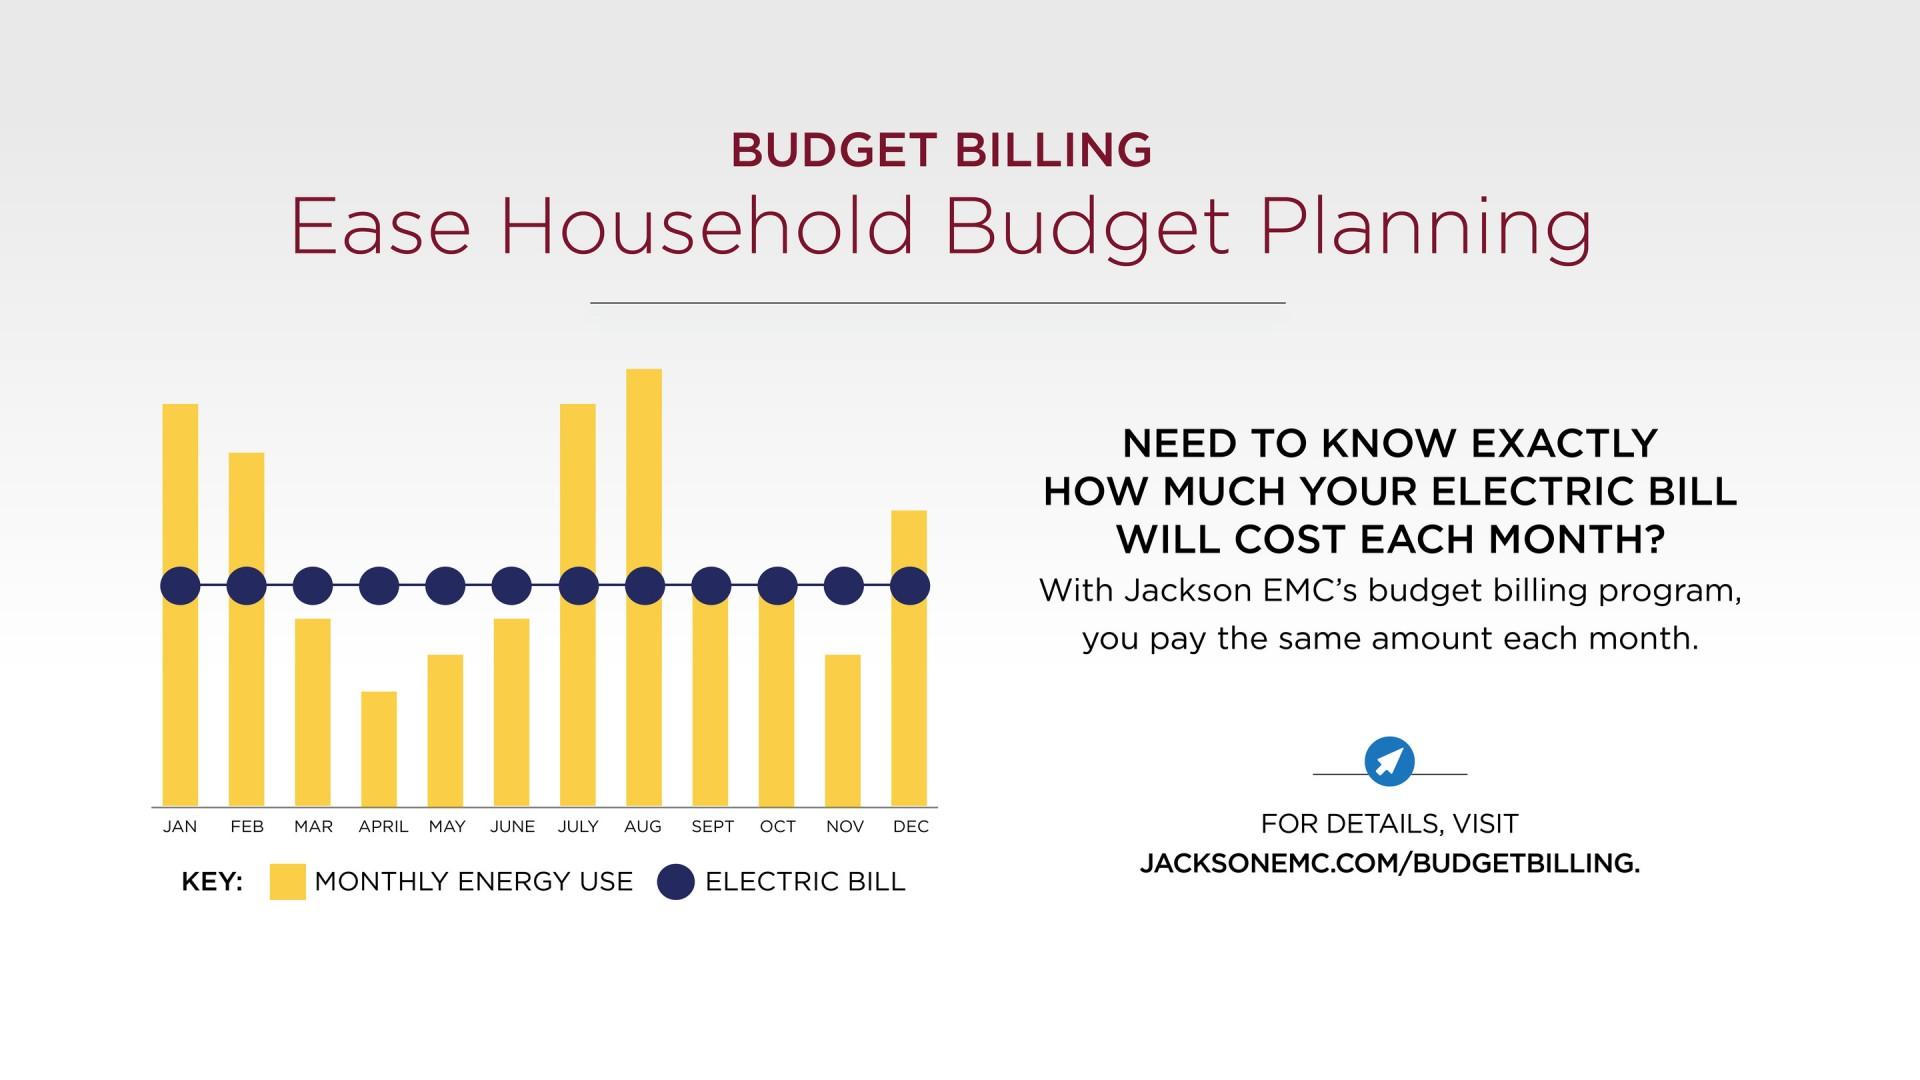 Budget Billing Ease Household Budget Planning